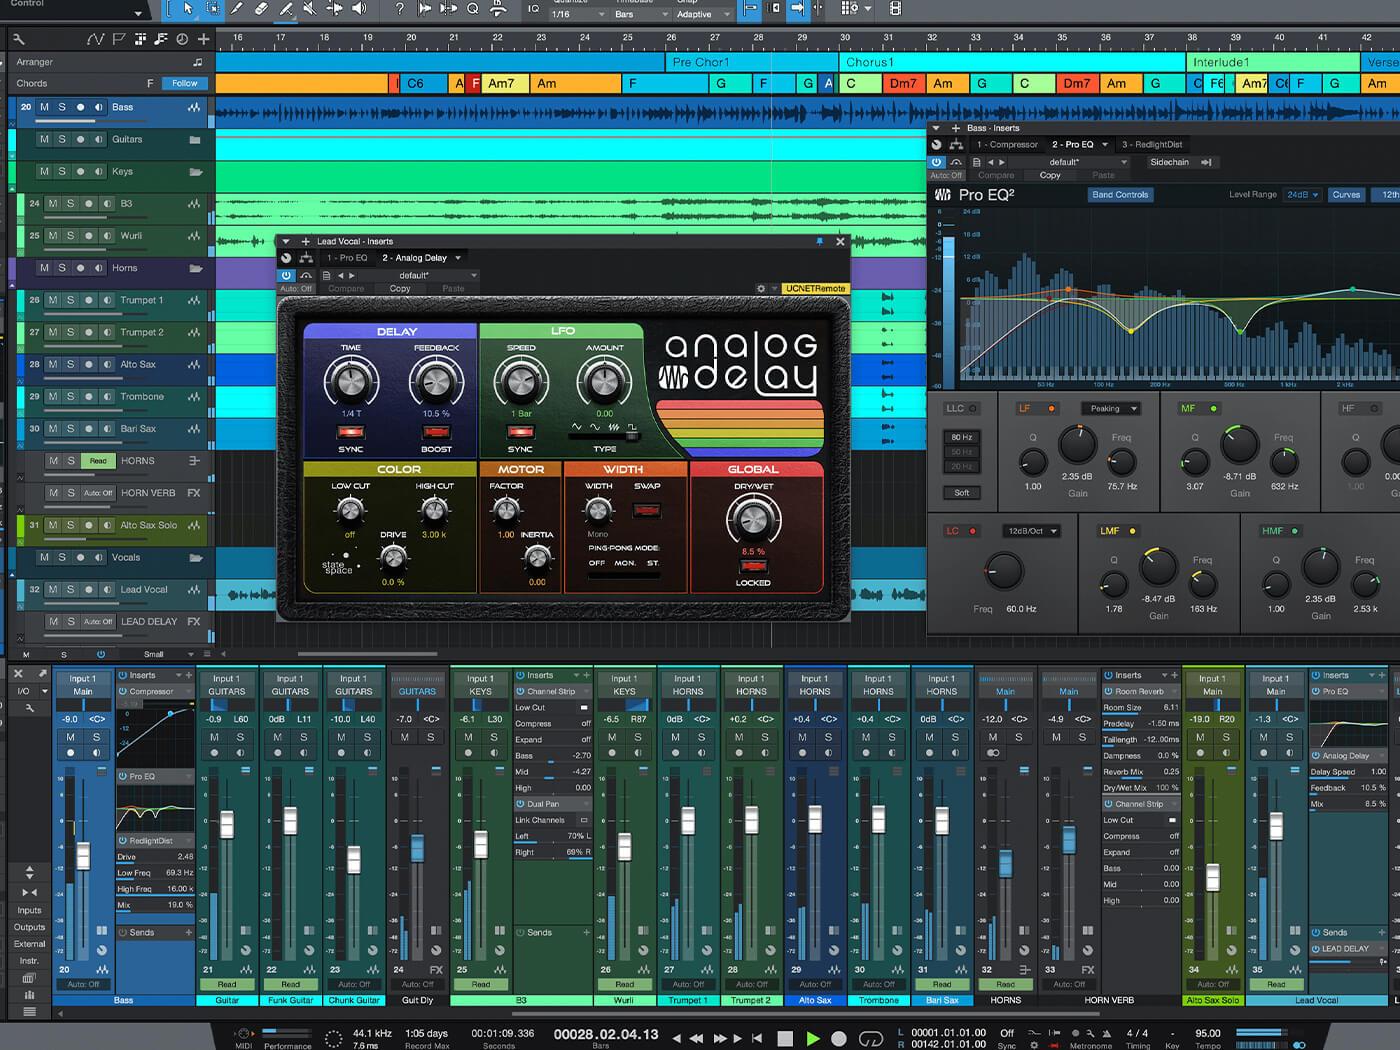 PreSonus-Studio-One-5-1400x1050-1